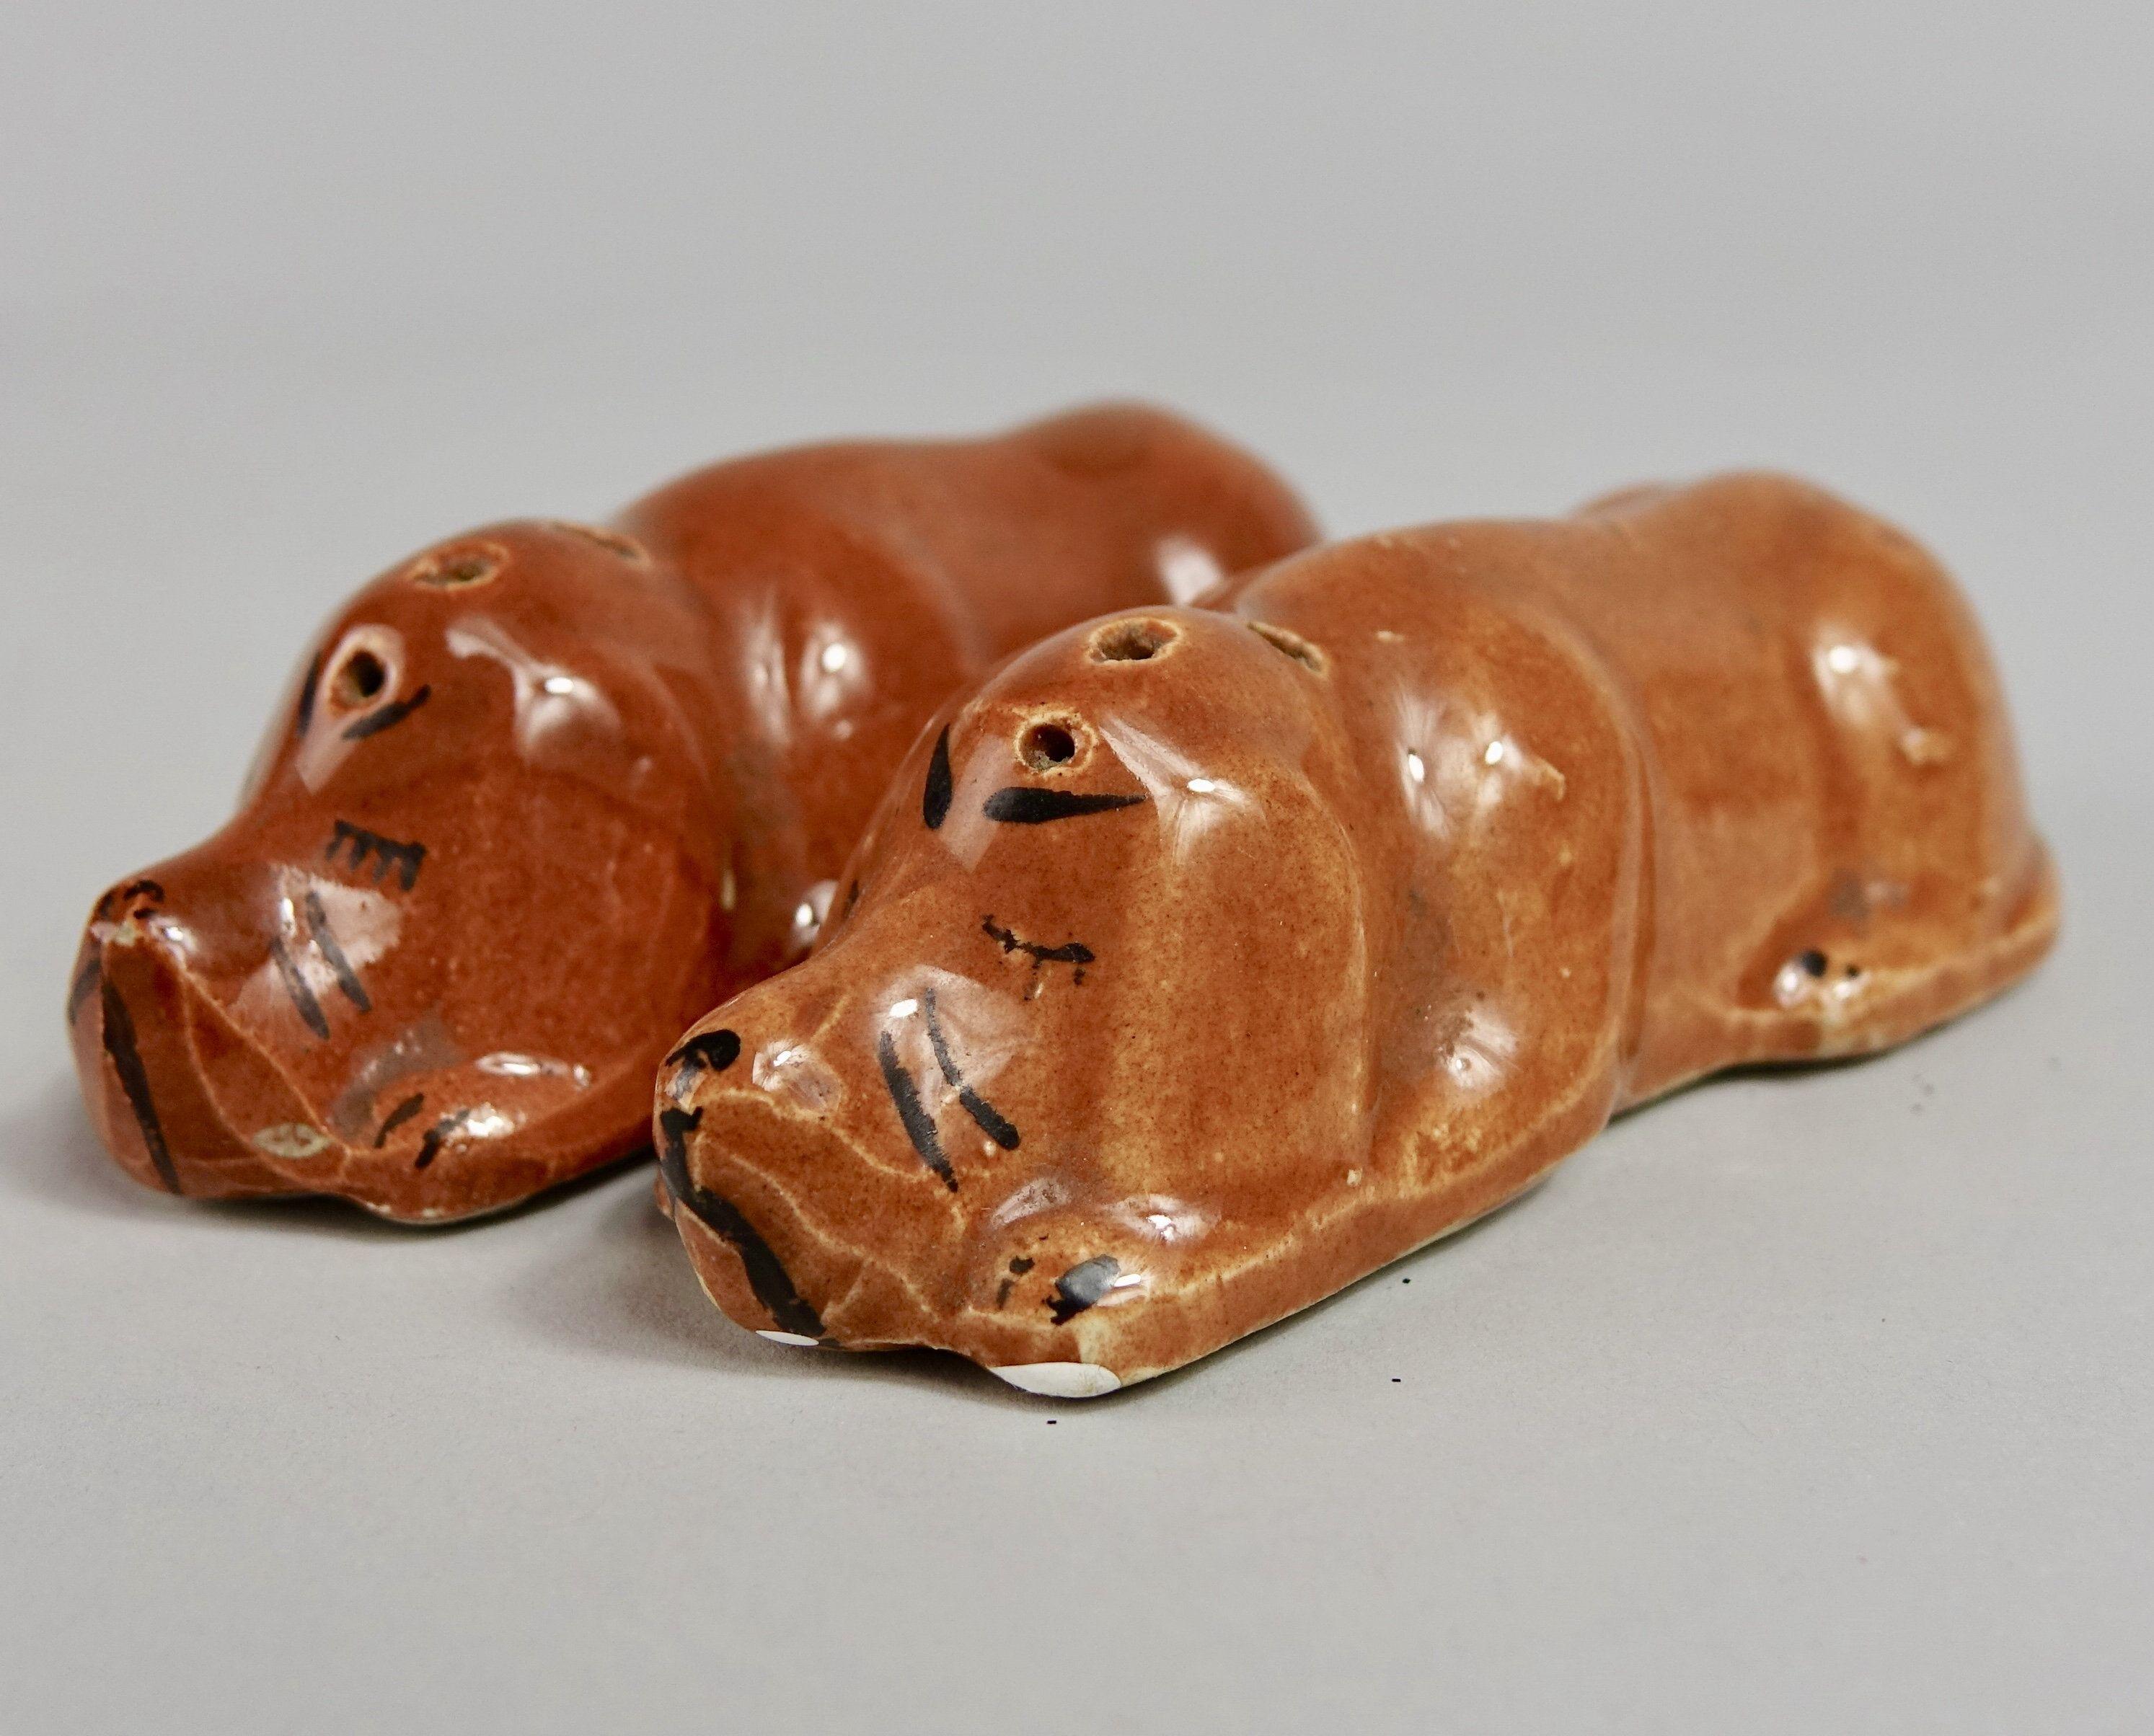 Sleeping Dog Salt and Pepper Shakers Sleeping dogs